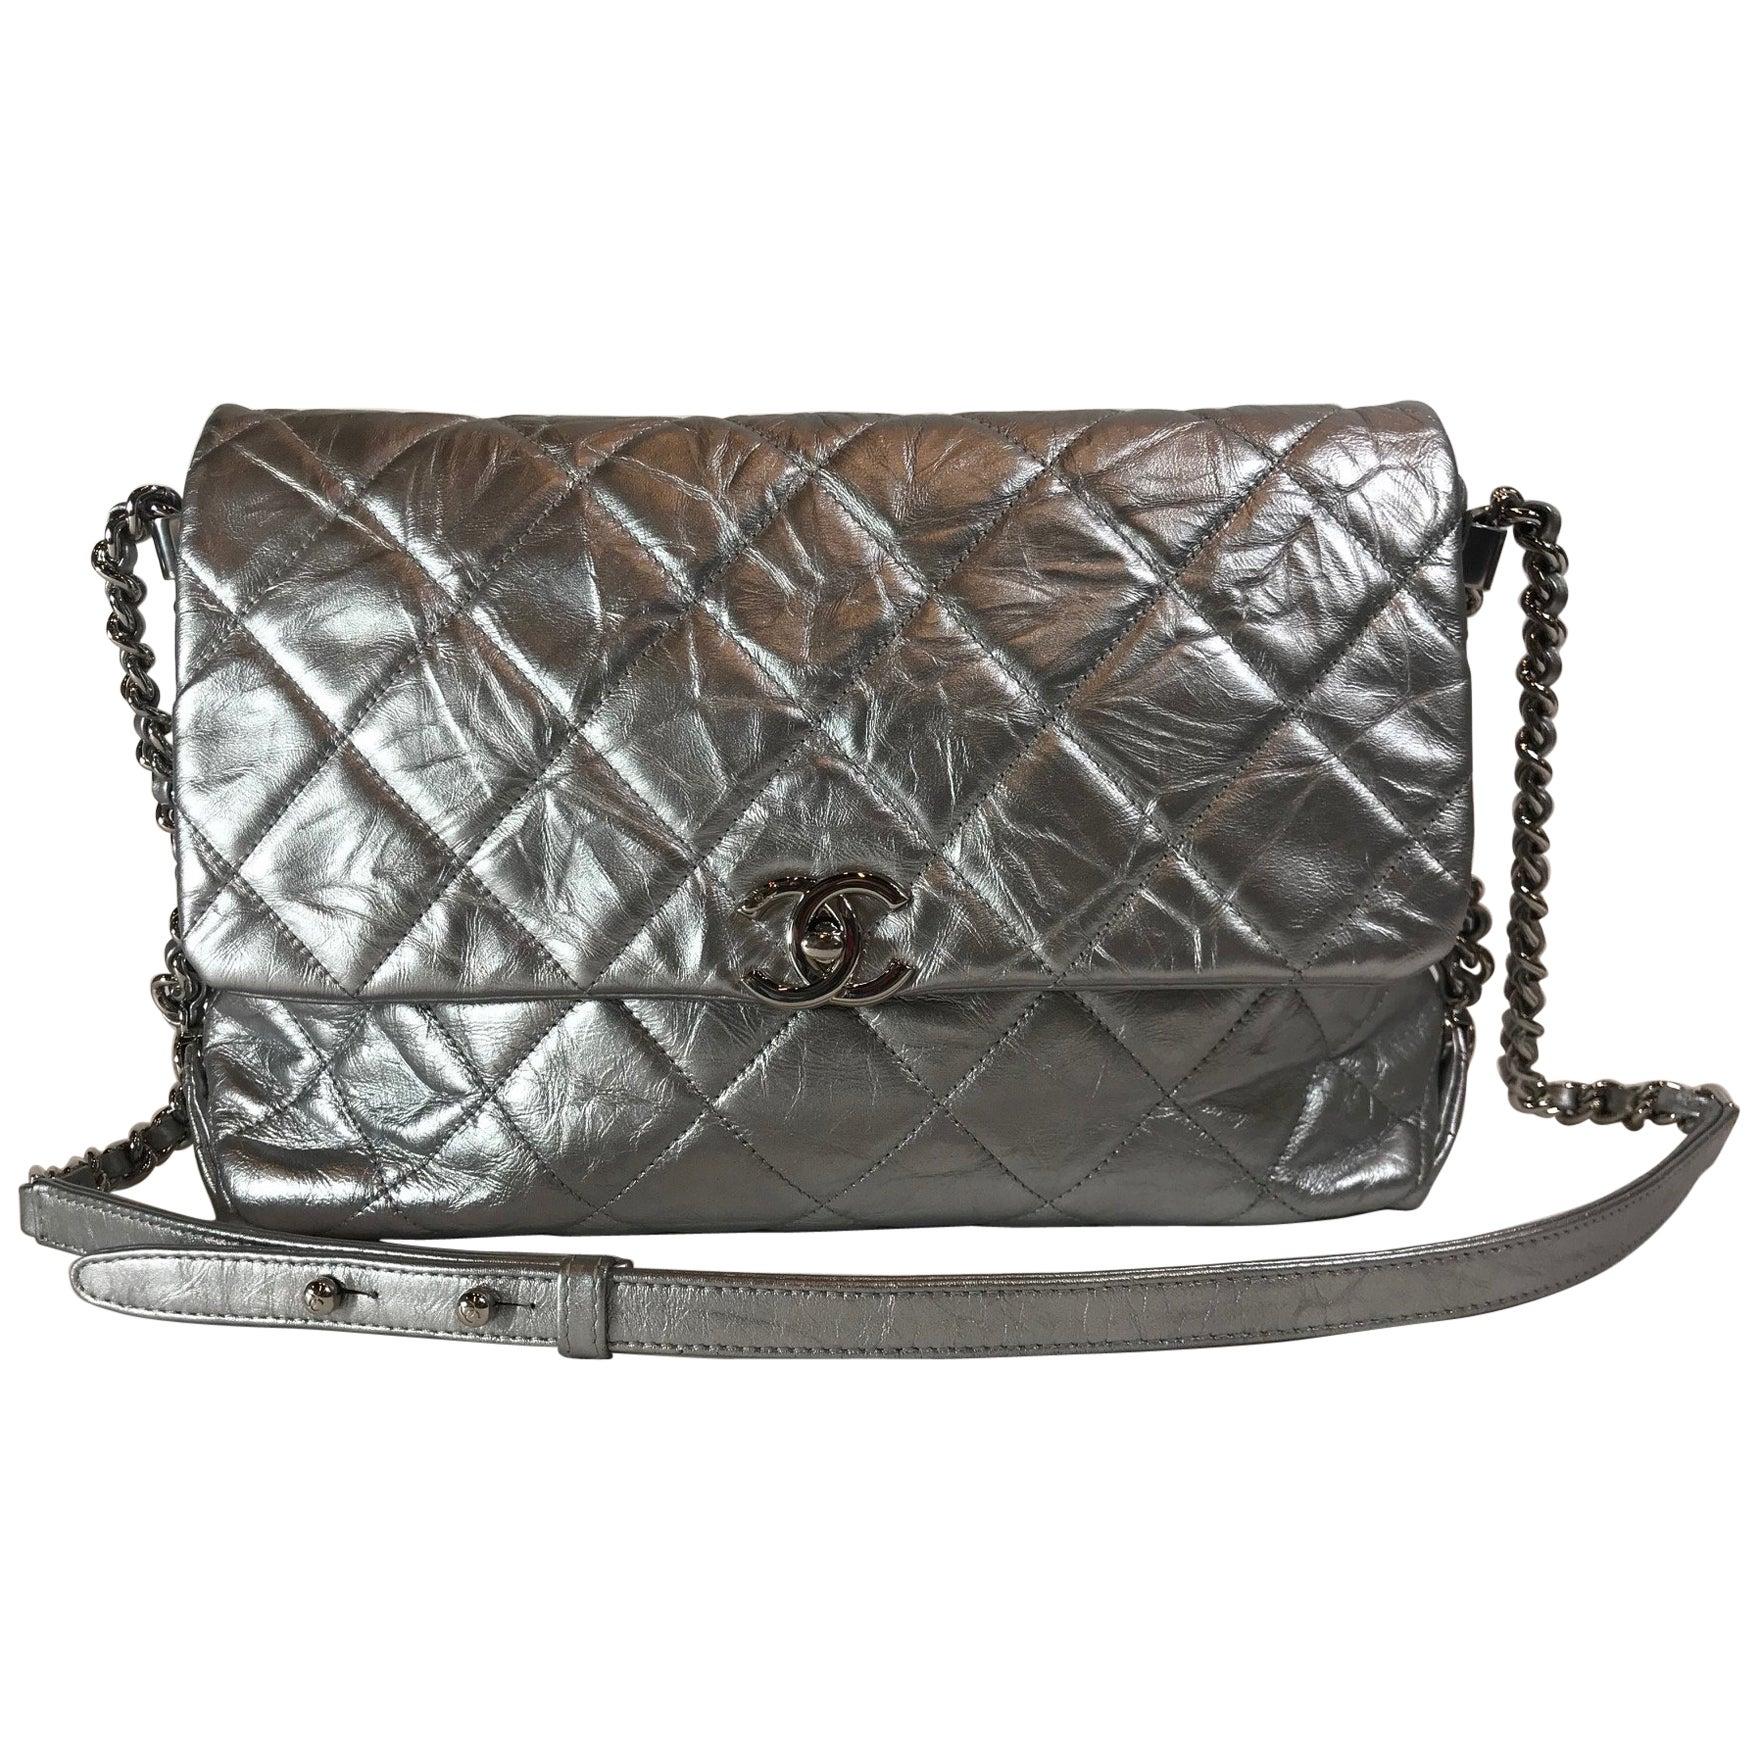 8019c597881c Chanel Metallic Crumpled Calfskin Big Bang Flap Bag For Sale at 1stdibs